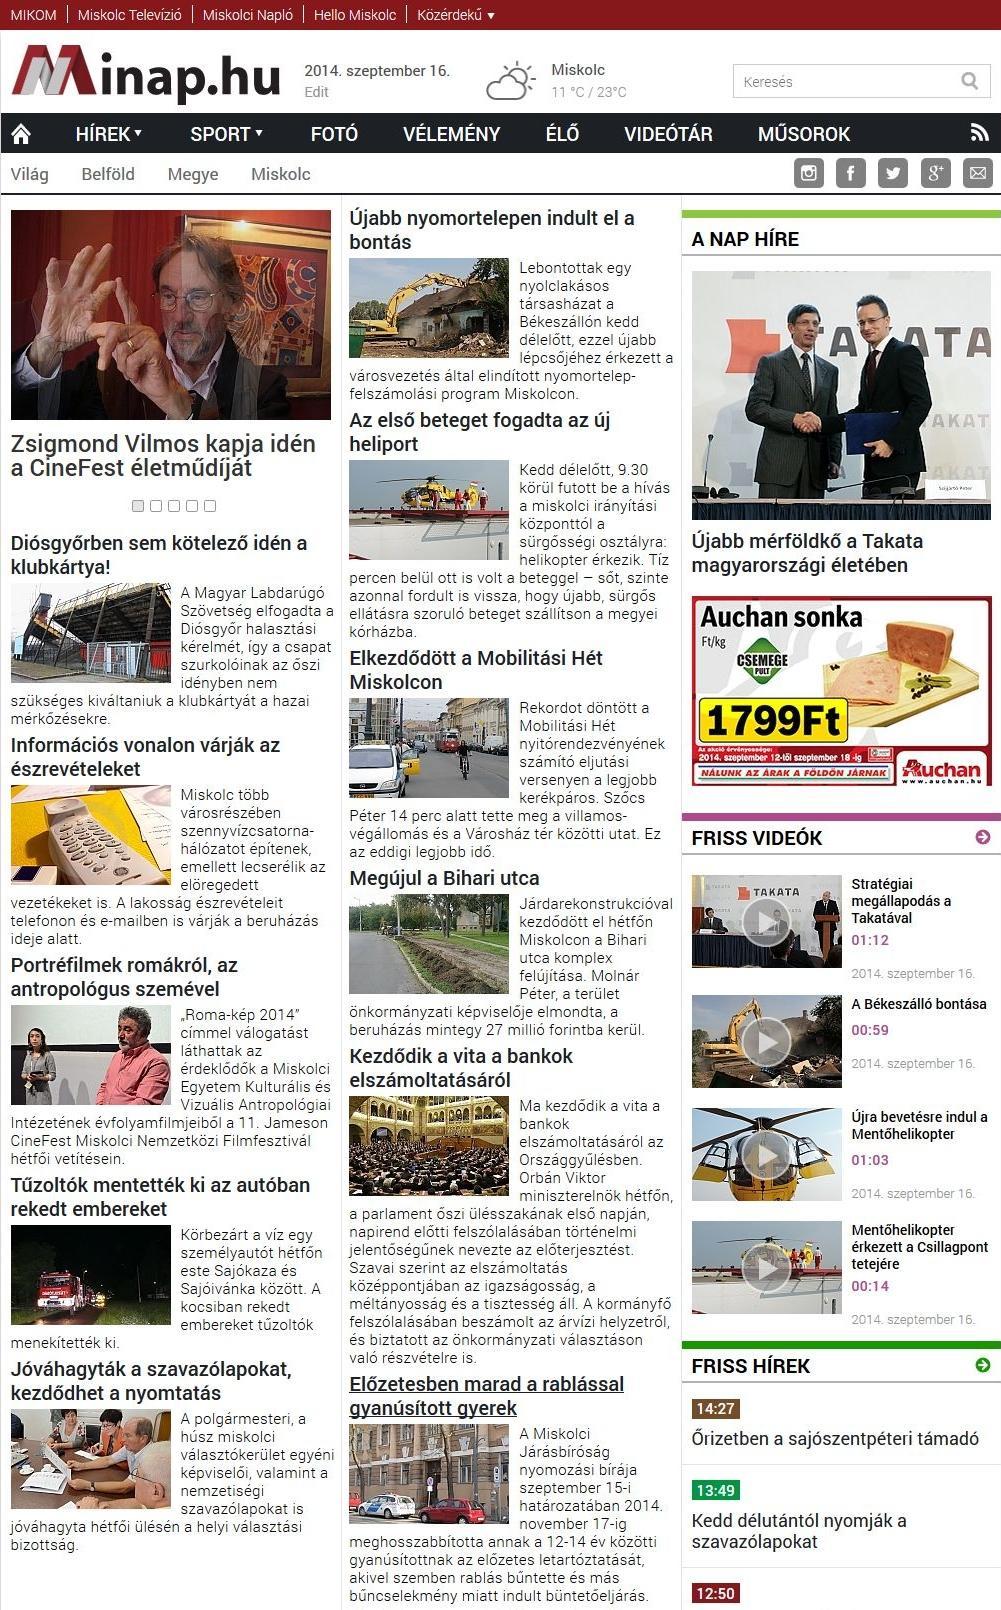 Minap regional news portal